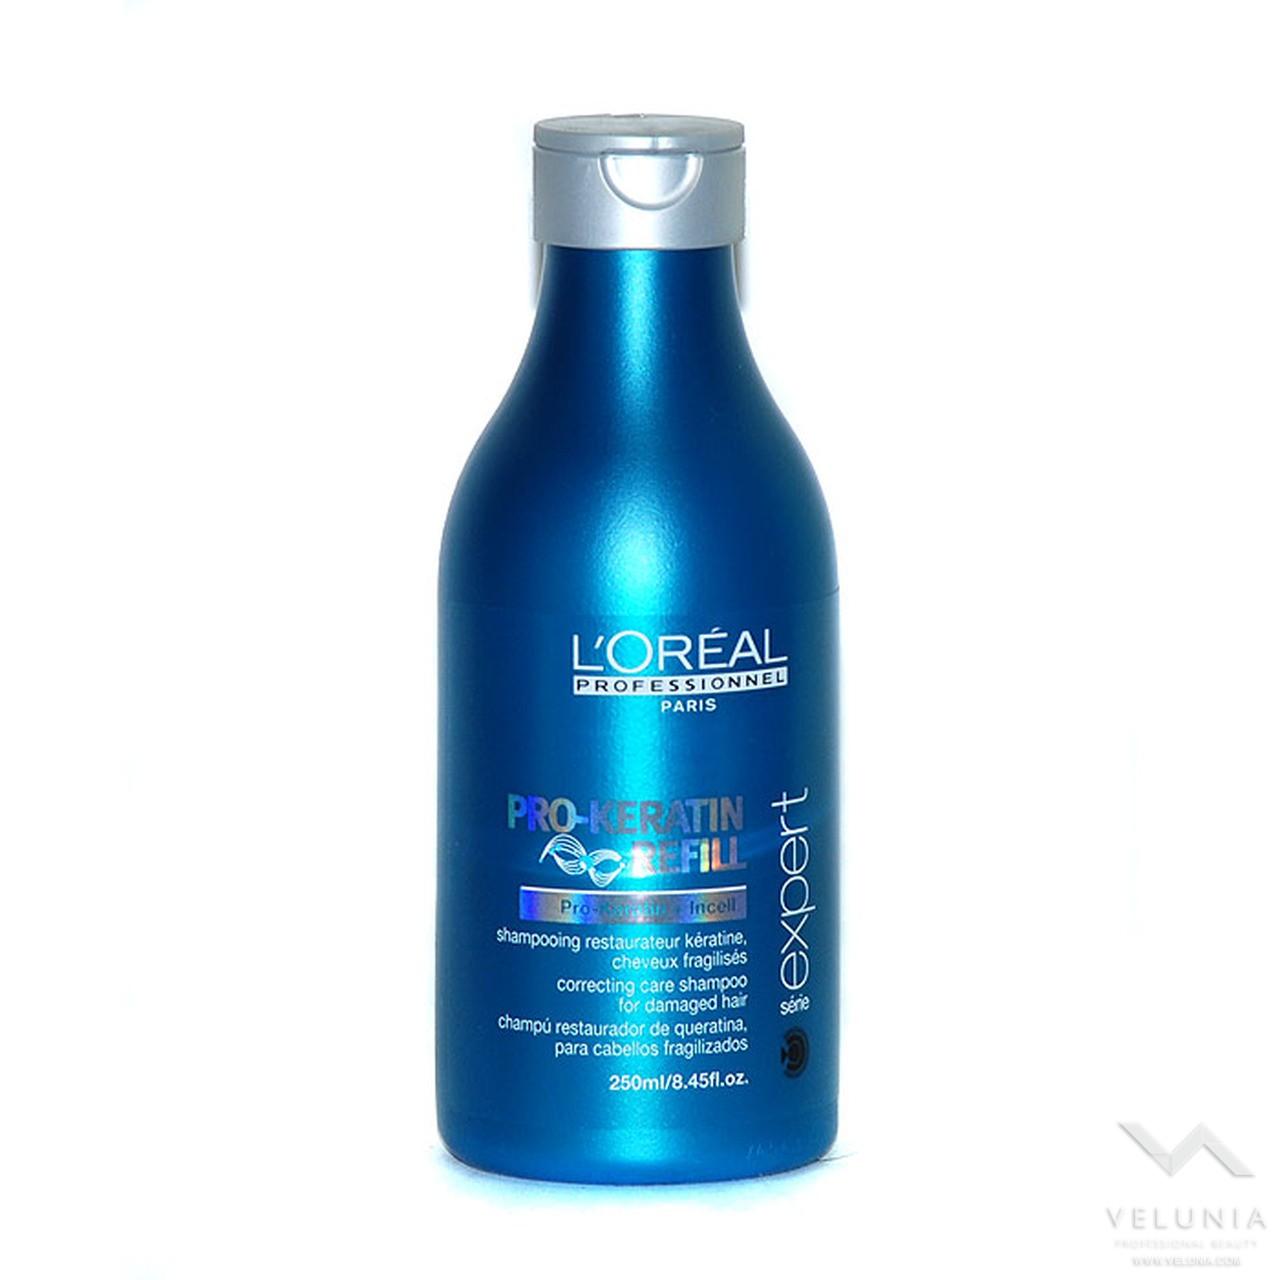 L'Oreal Expert Pro-Keratine Refill 250ml 1